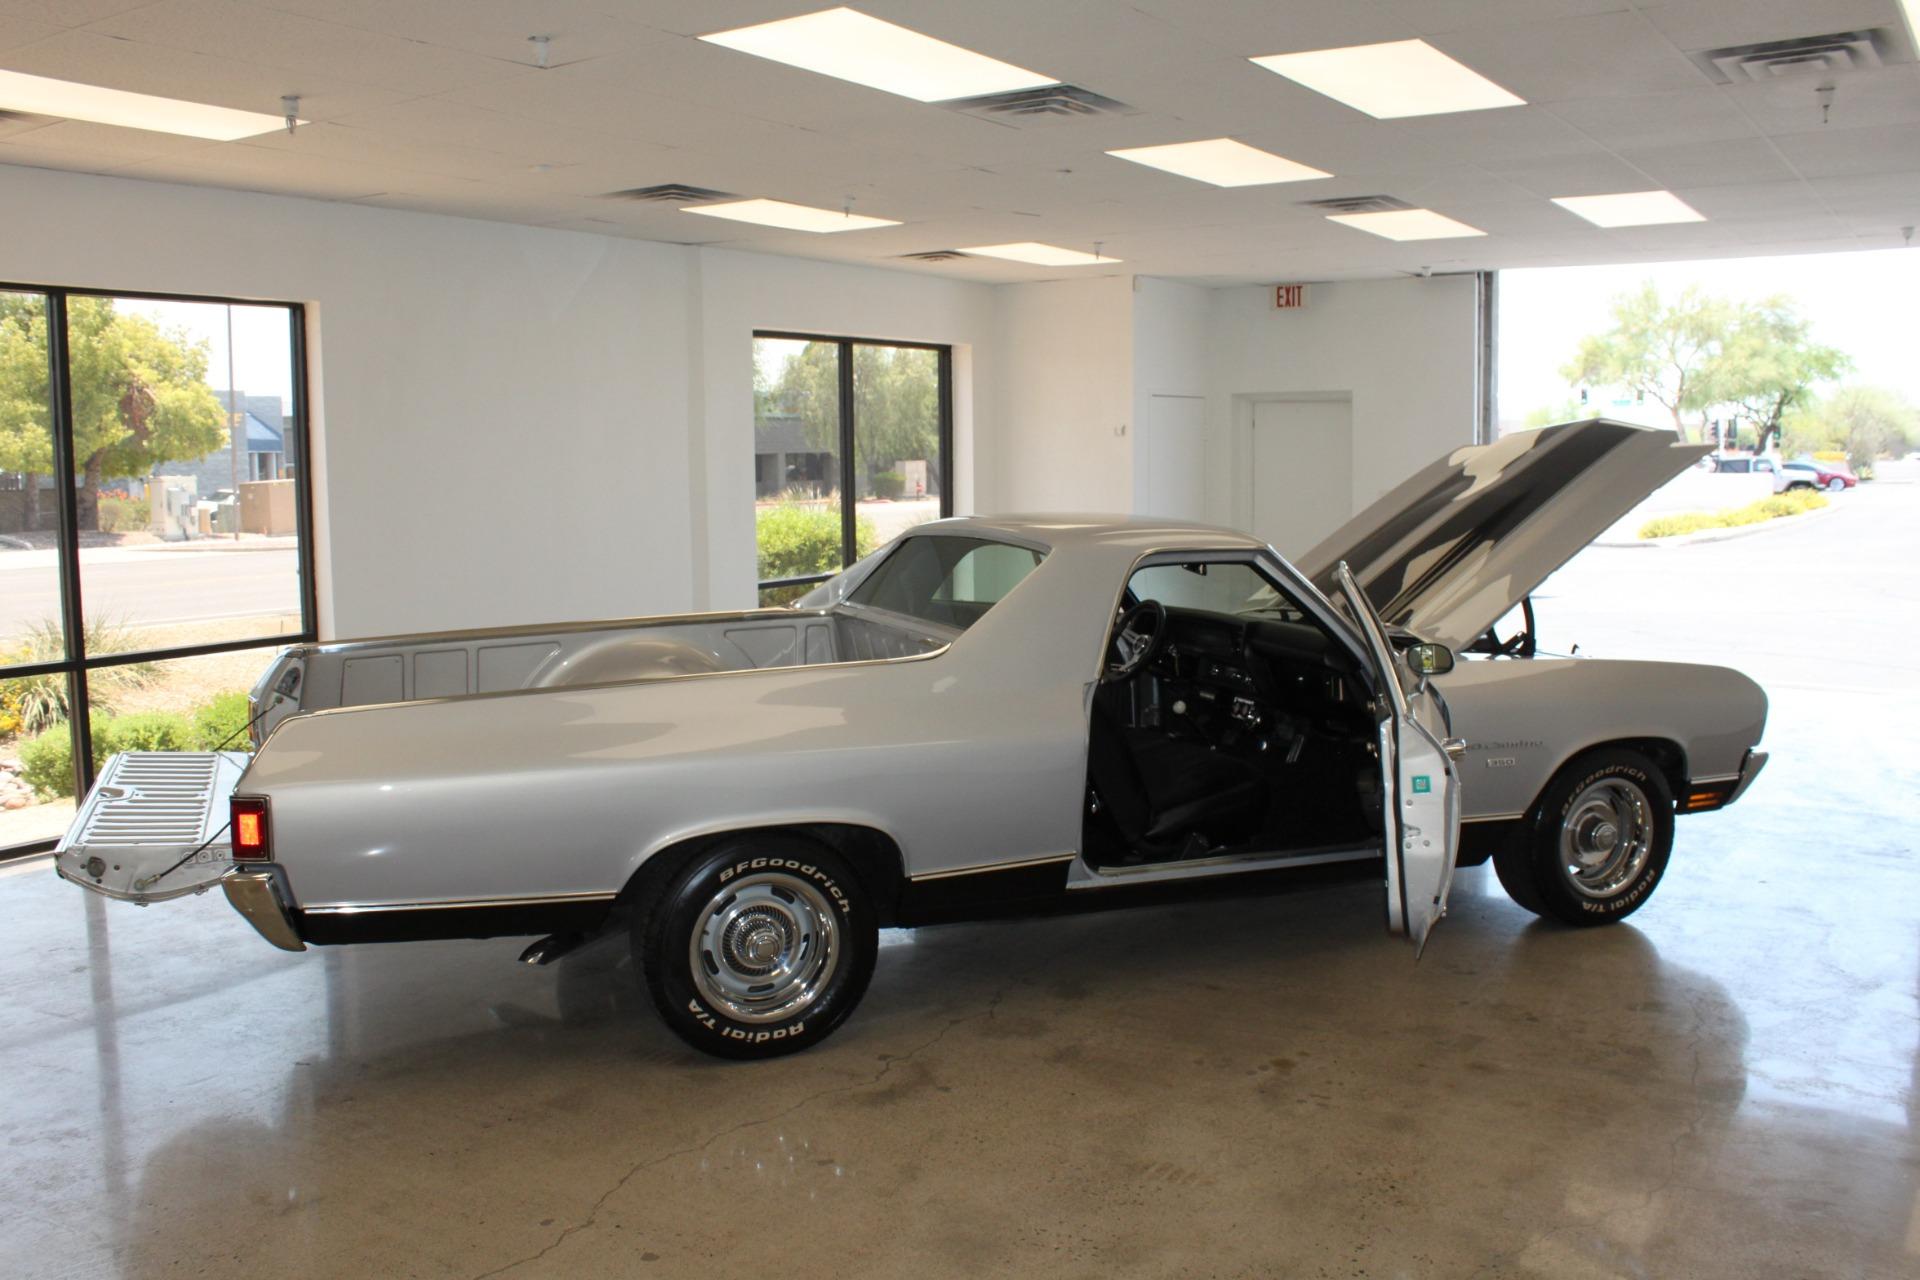 Used-1970-Chevrolet-El-Camino-Custom-350-ci-Lincoln